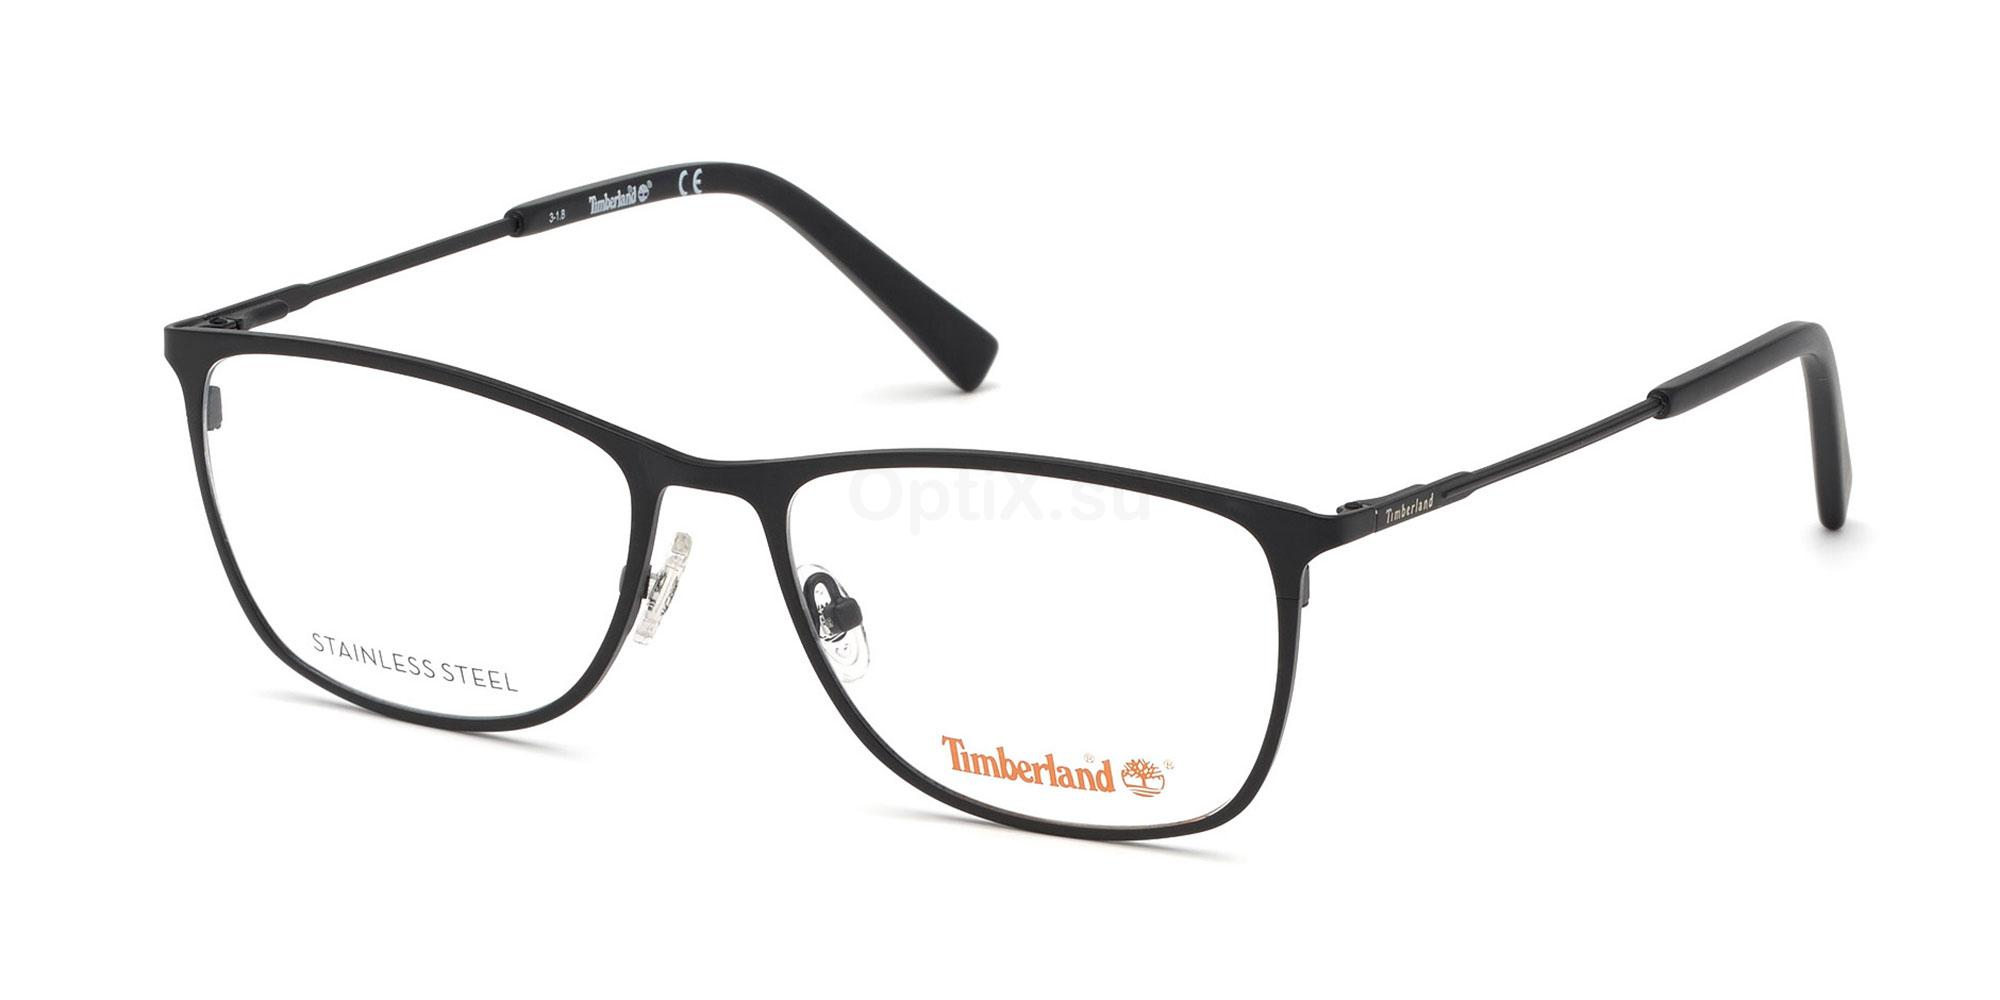 002 TB1616 Glasses, Timberland